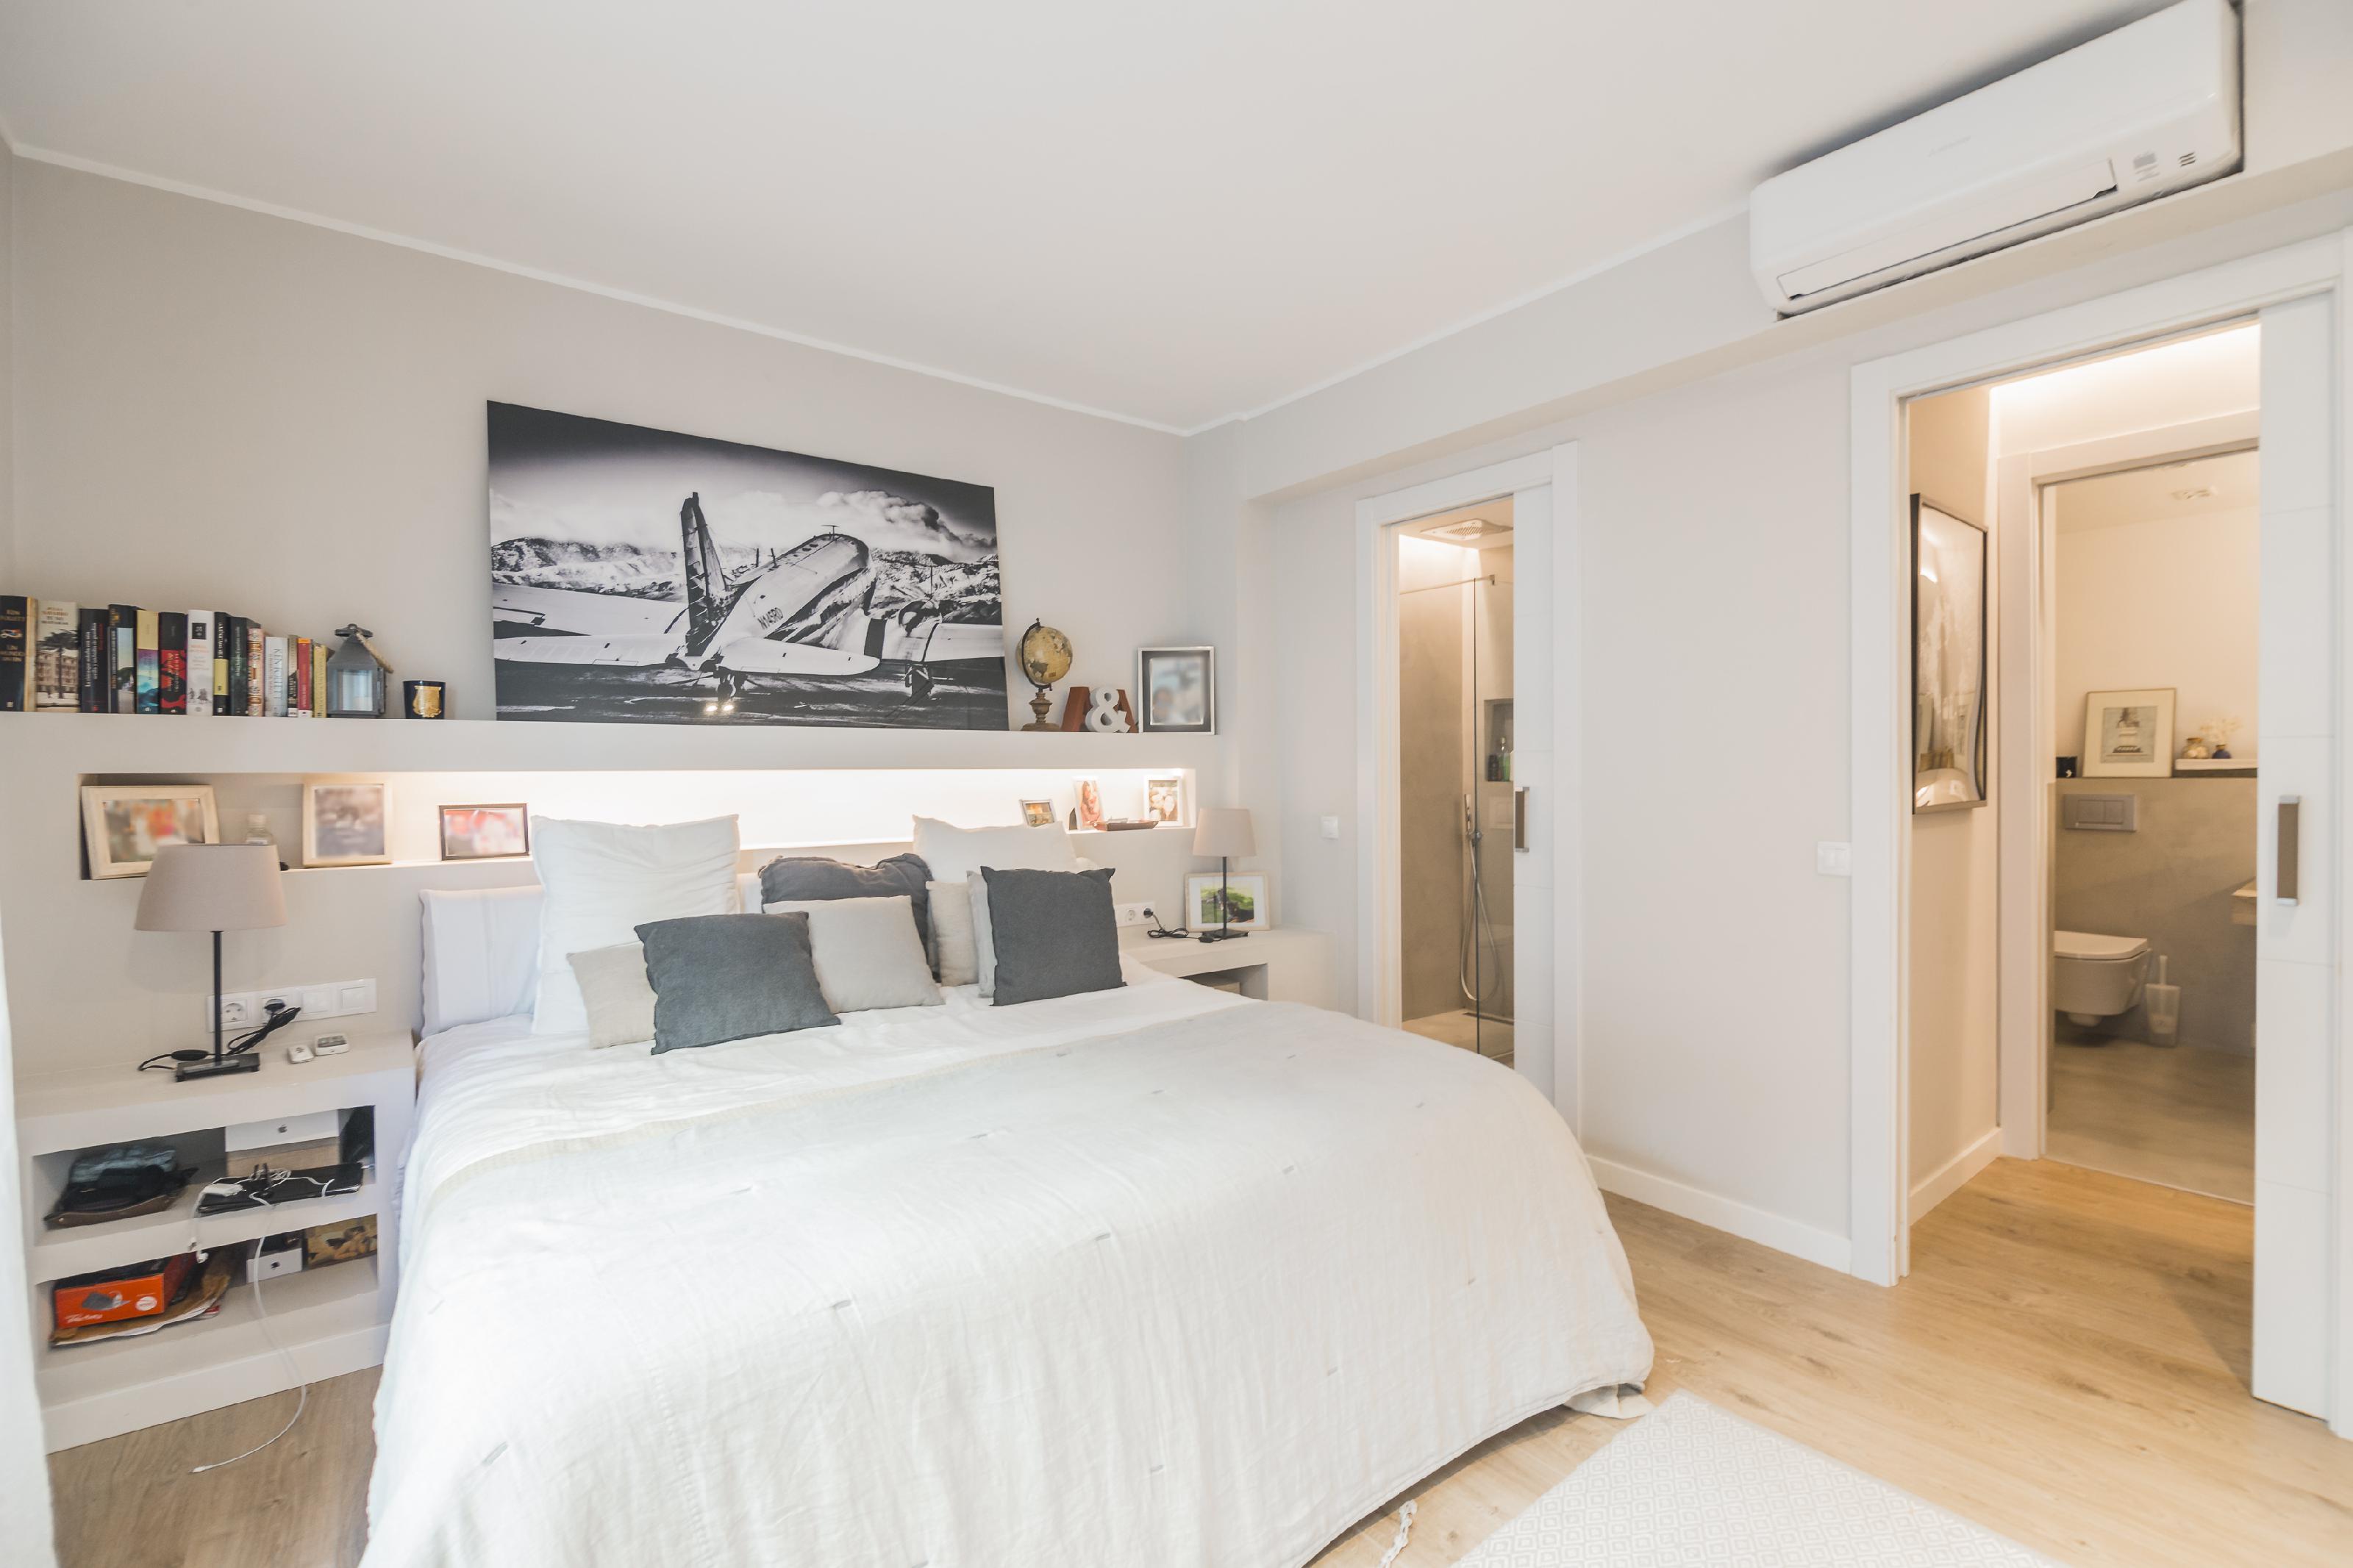 244392 Flat for sale in Sarrià-Sant Gervasi, Sant Gervasi-Galvany 22